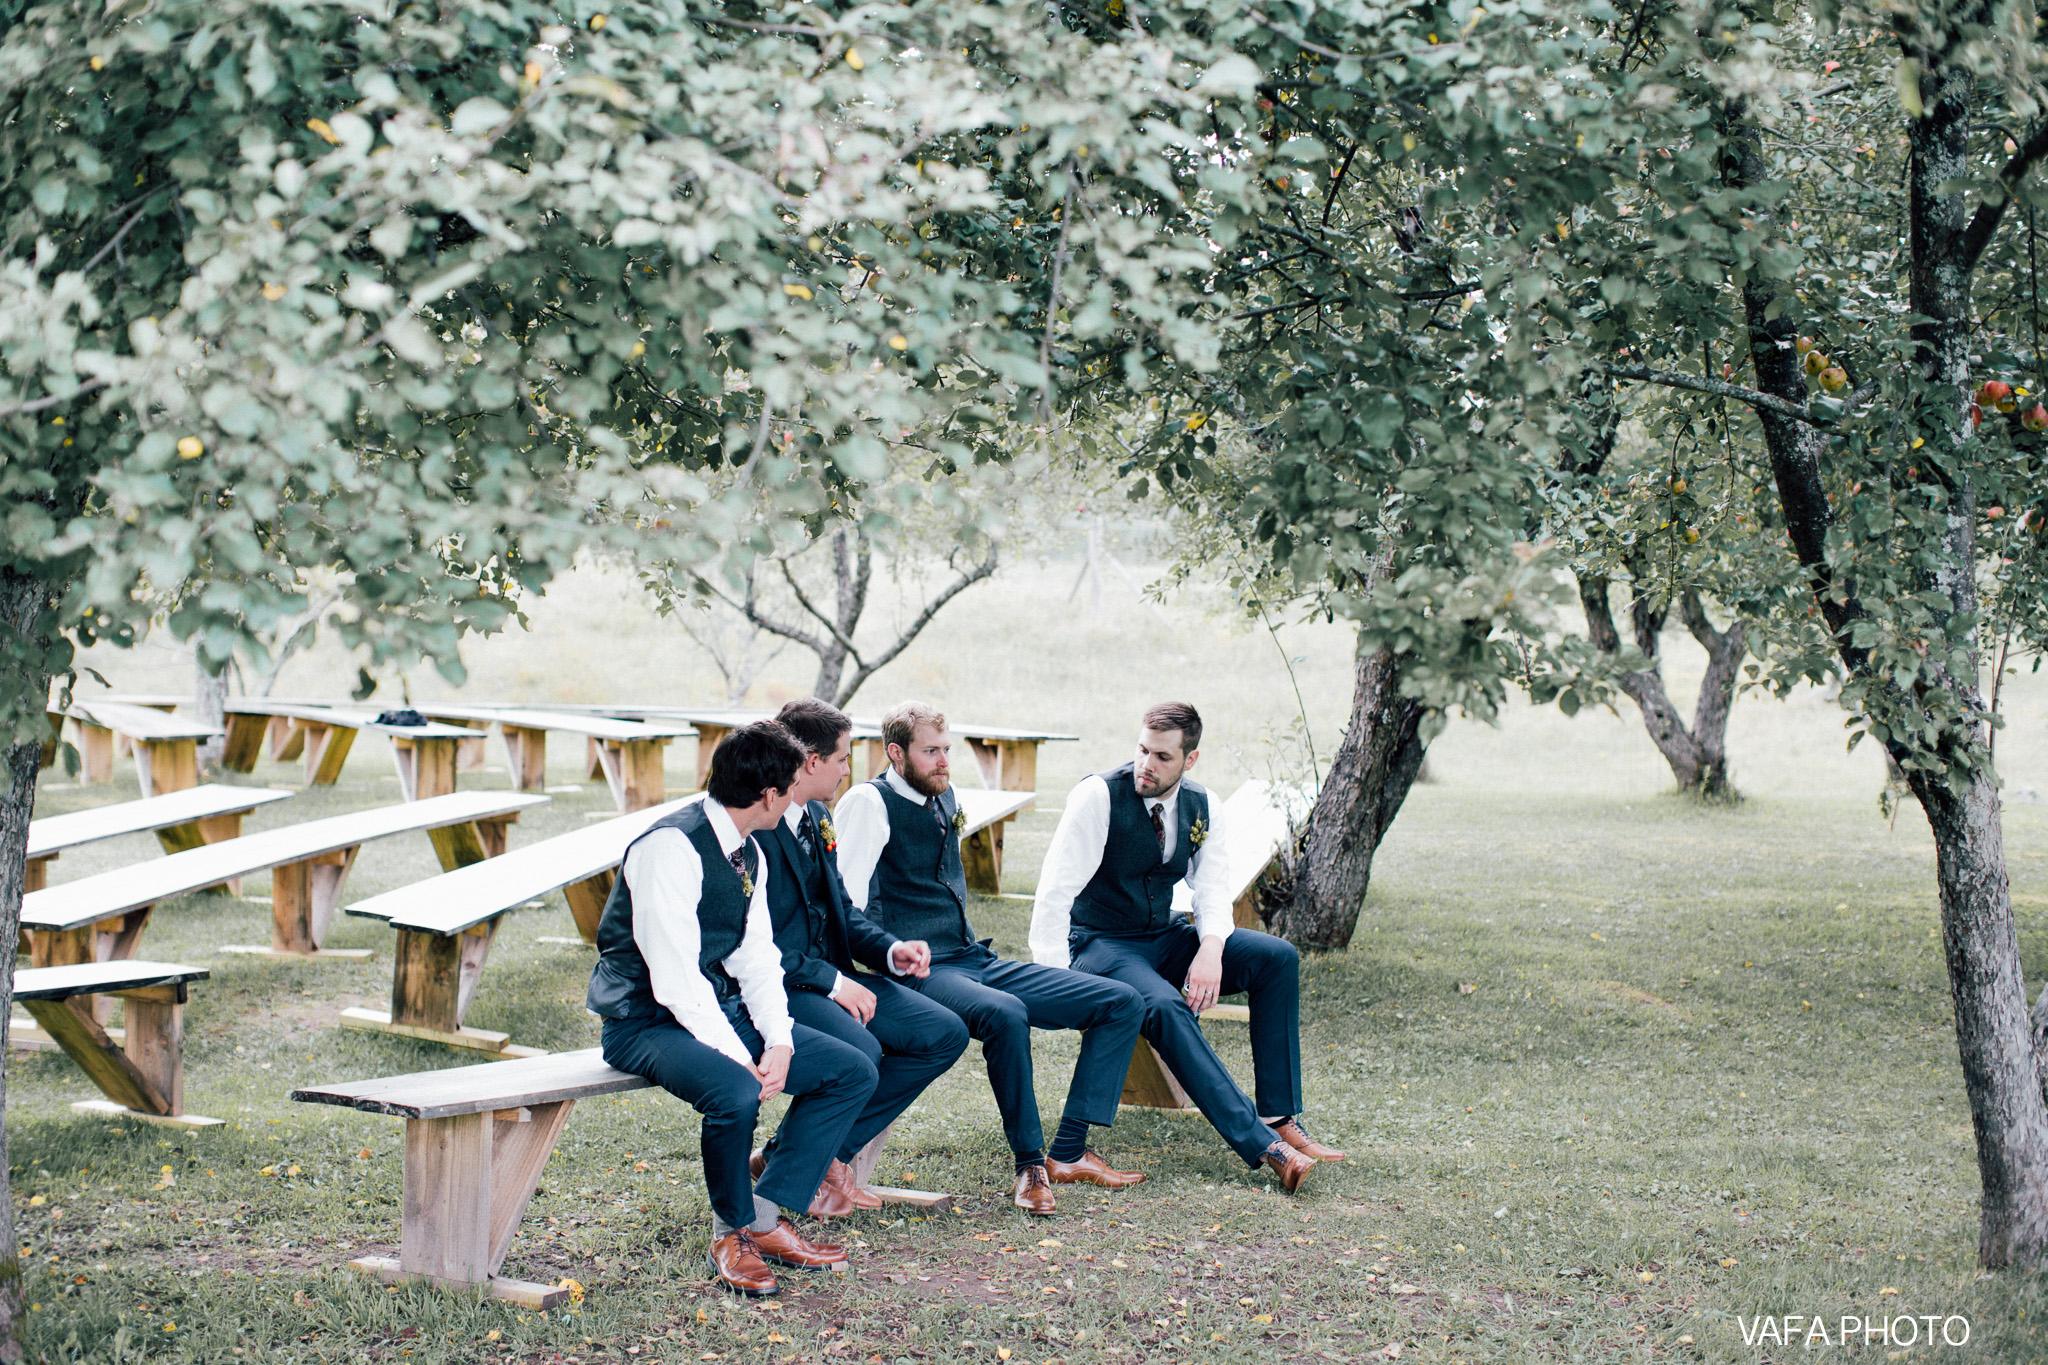 Belsolda-Farm-Wedding-Christy-Eric-Vafa-Photo-536.jpg